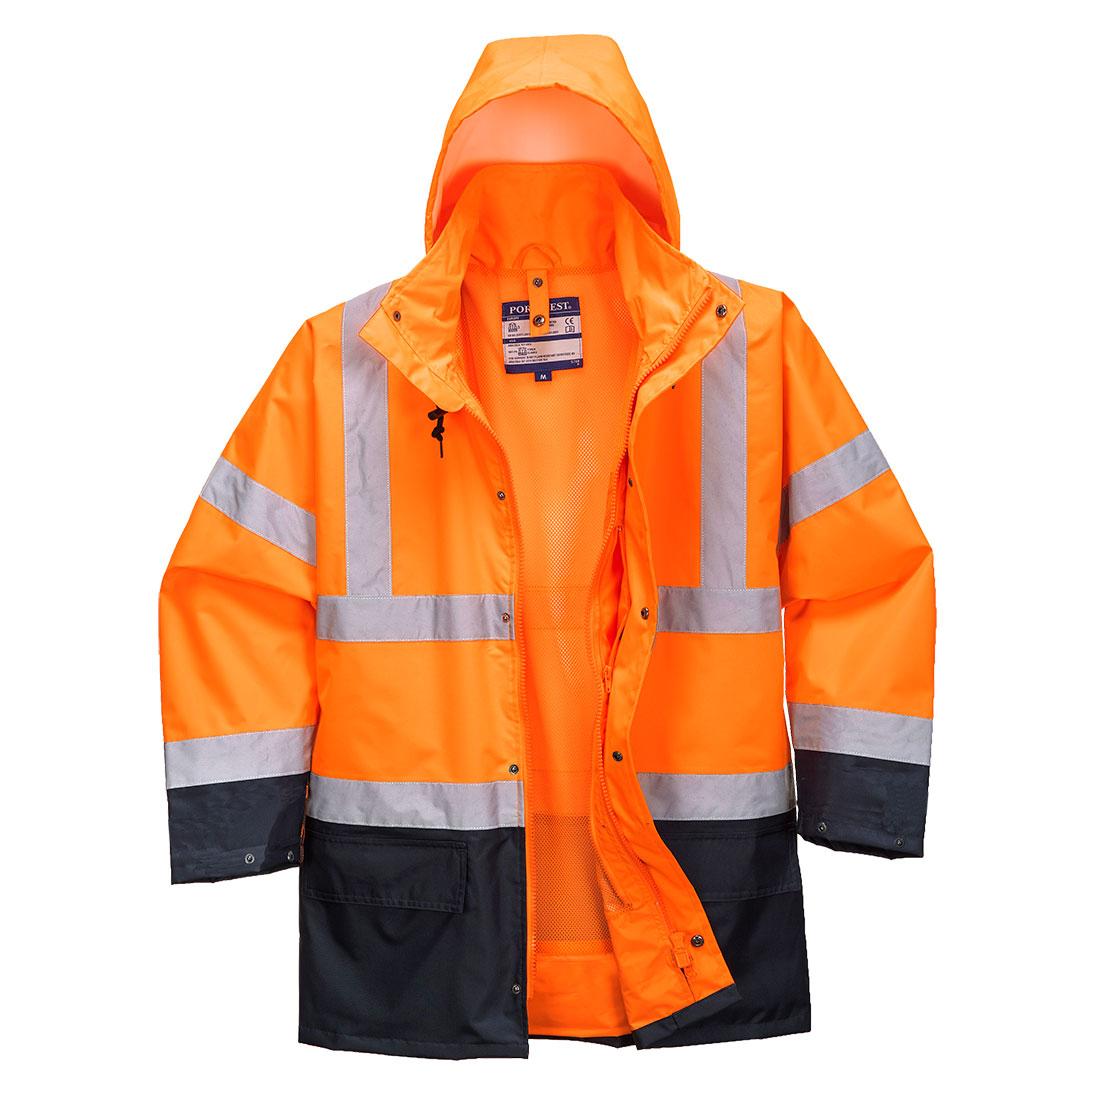 8eb6183611 Safety at Work - Portwest - dzseki, kabát